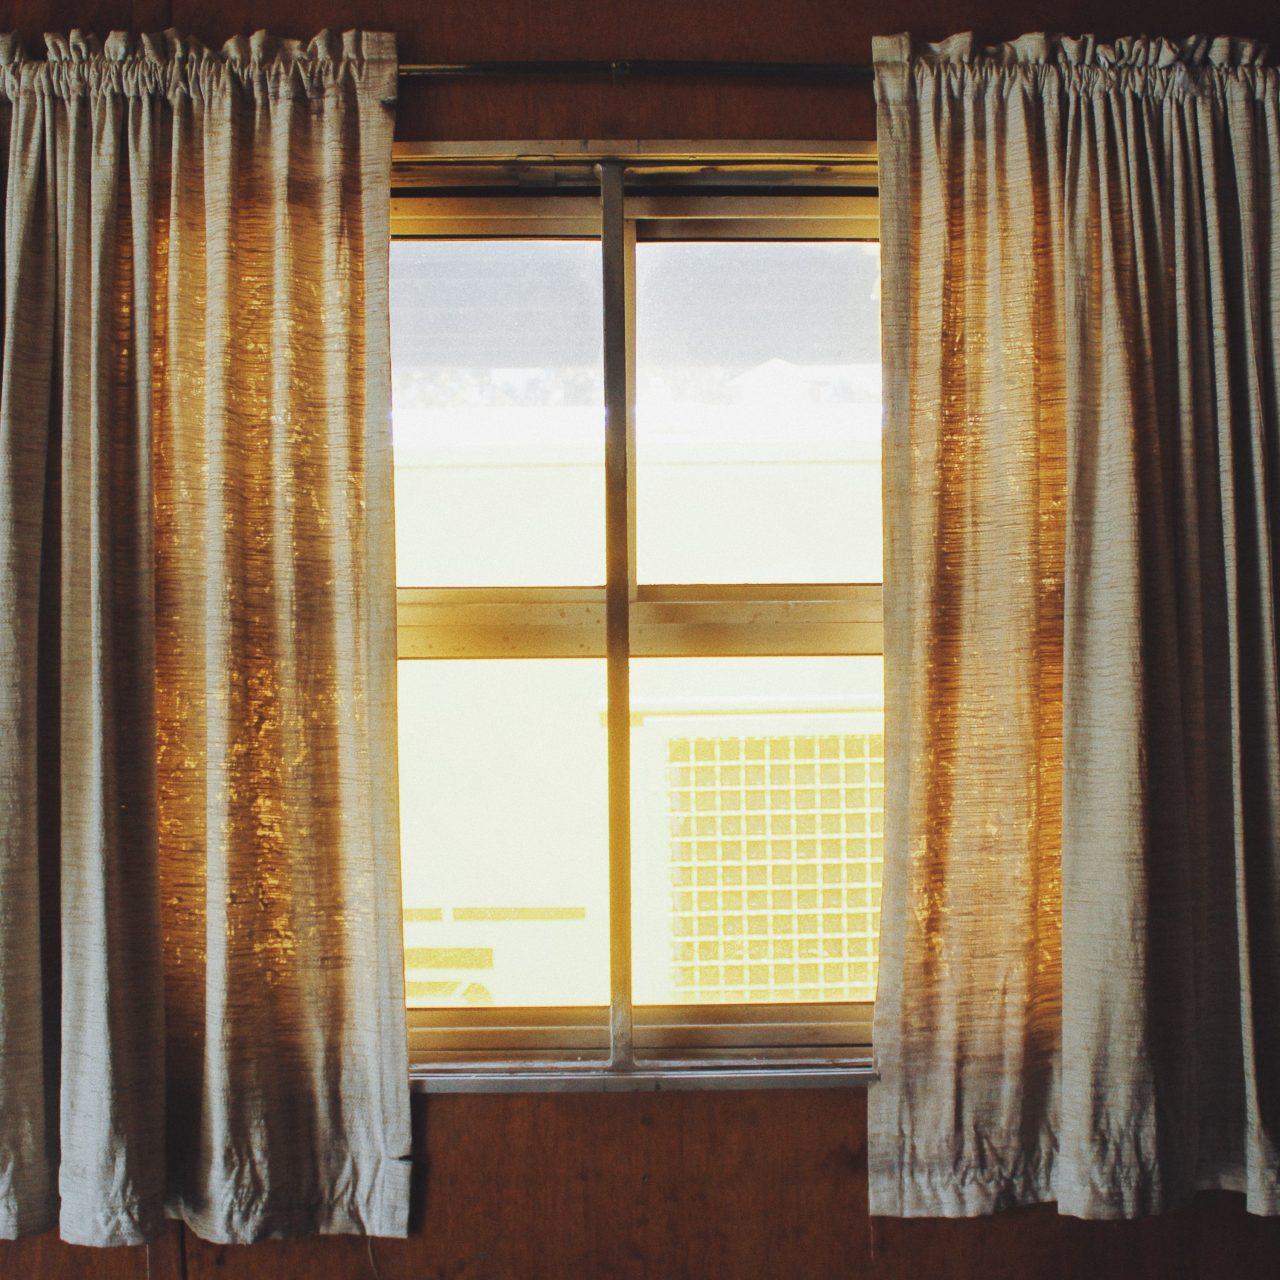 https://climalit.es/blog/wp-content/uploads/2018/06/cortinas-térmicas-1280x1280.jpg